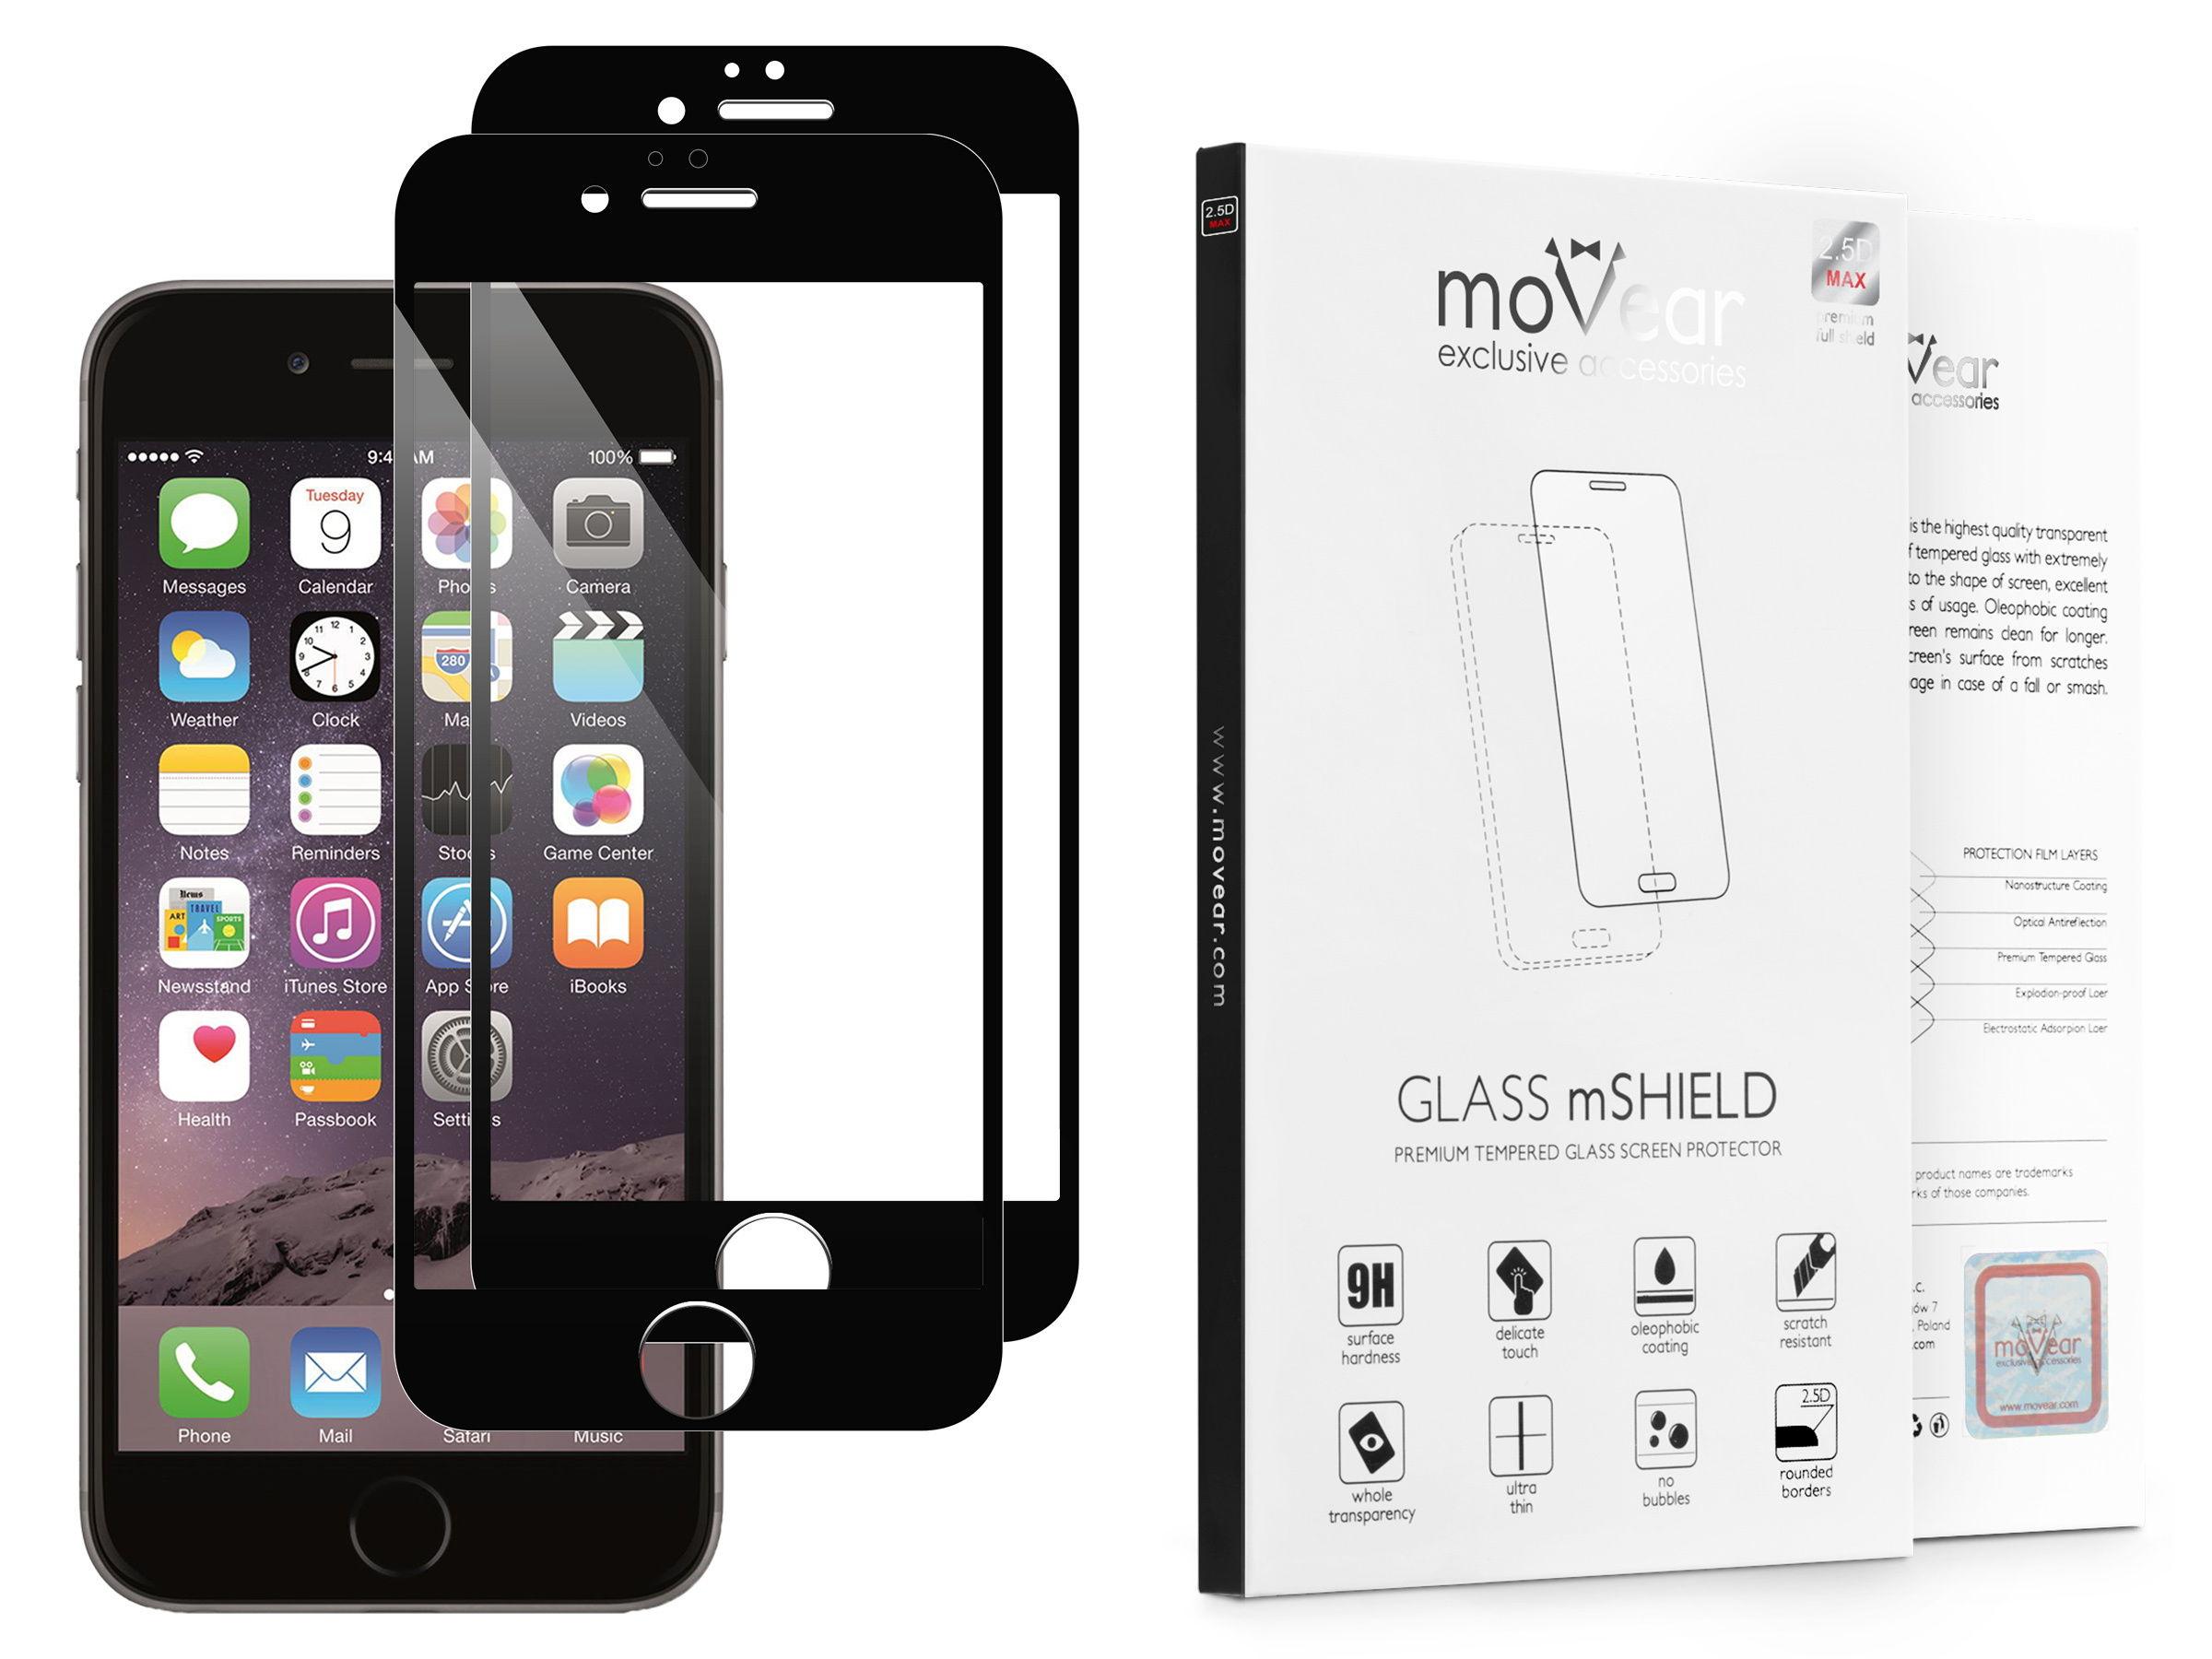 2 szt.   moVear Szkło Hartowane 2.5D MAX na Apple iPhone 6 / 6s   do etui, 9H   GLASS mSHIELD Czarny